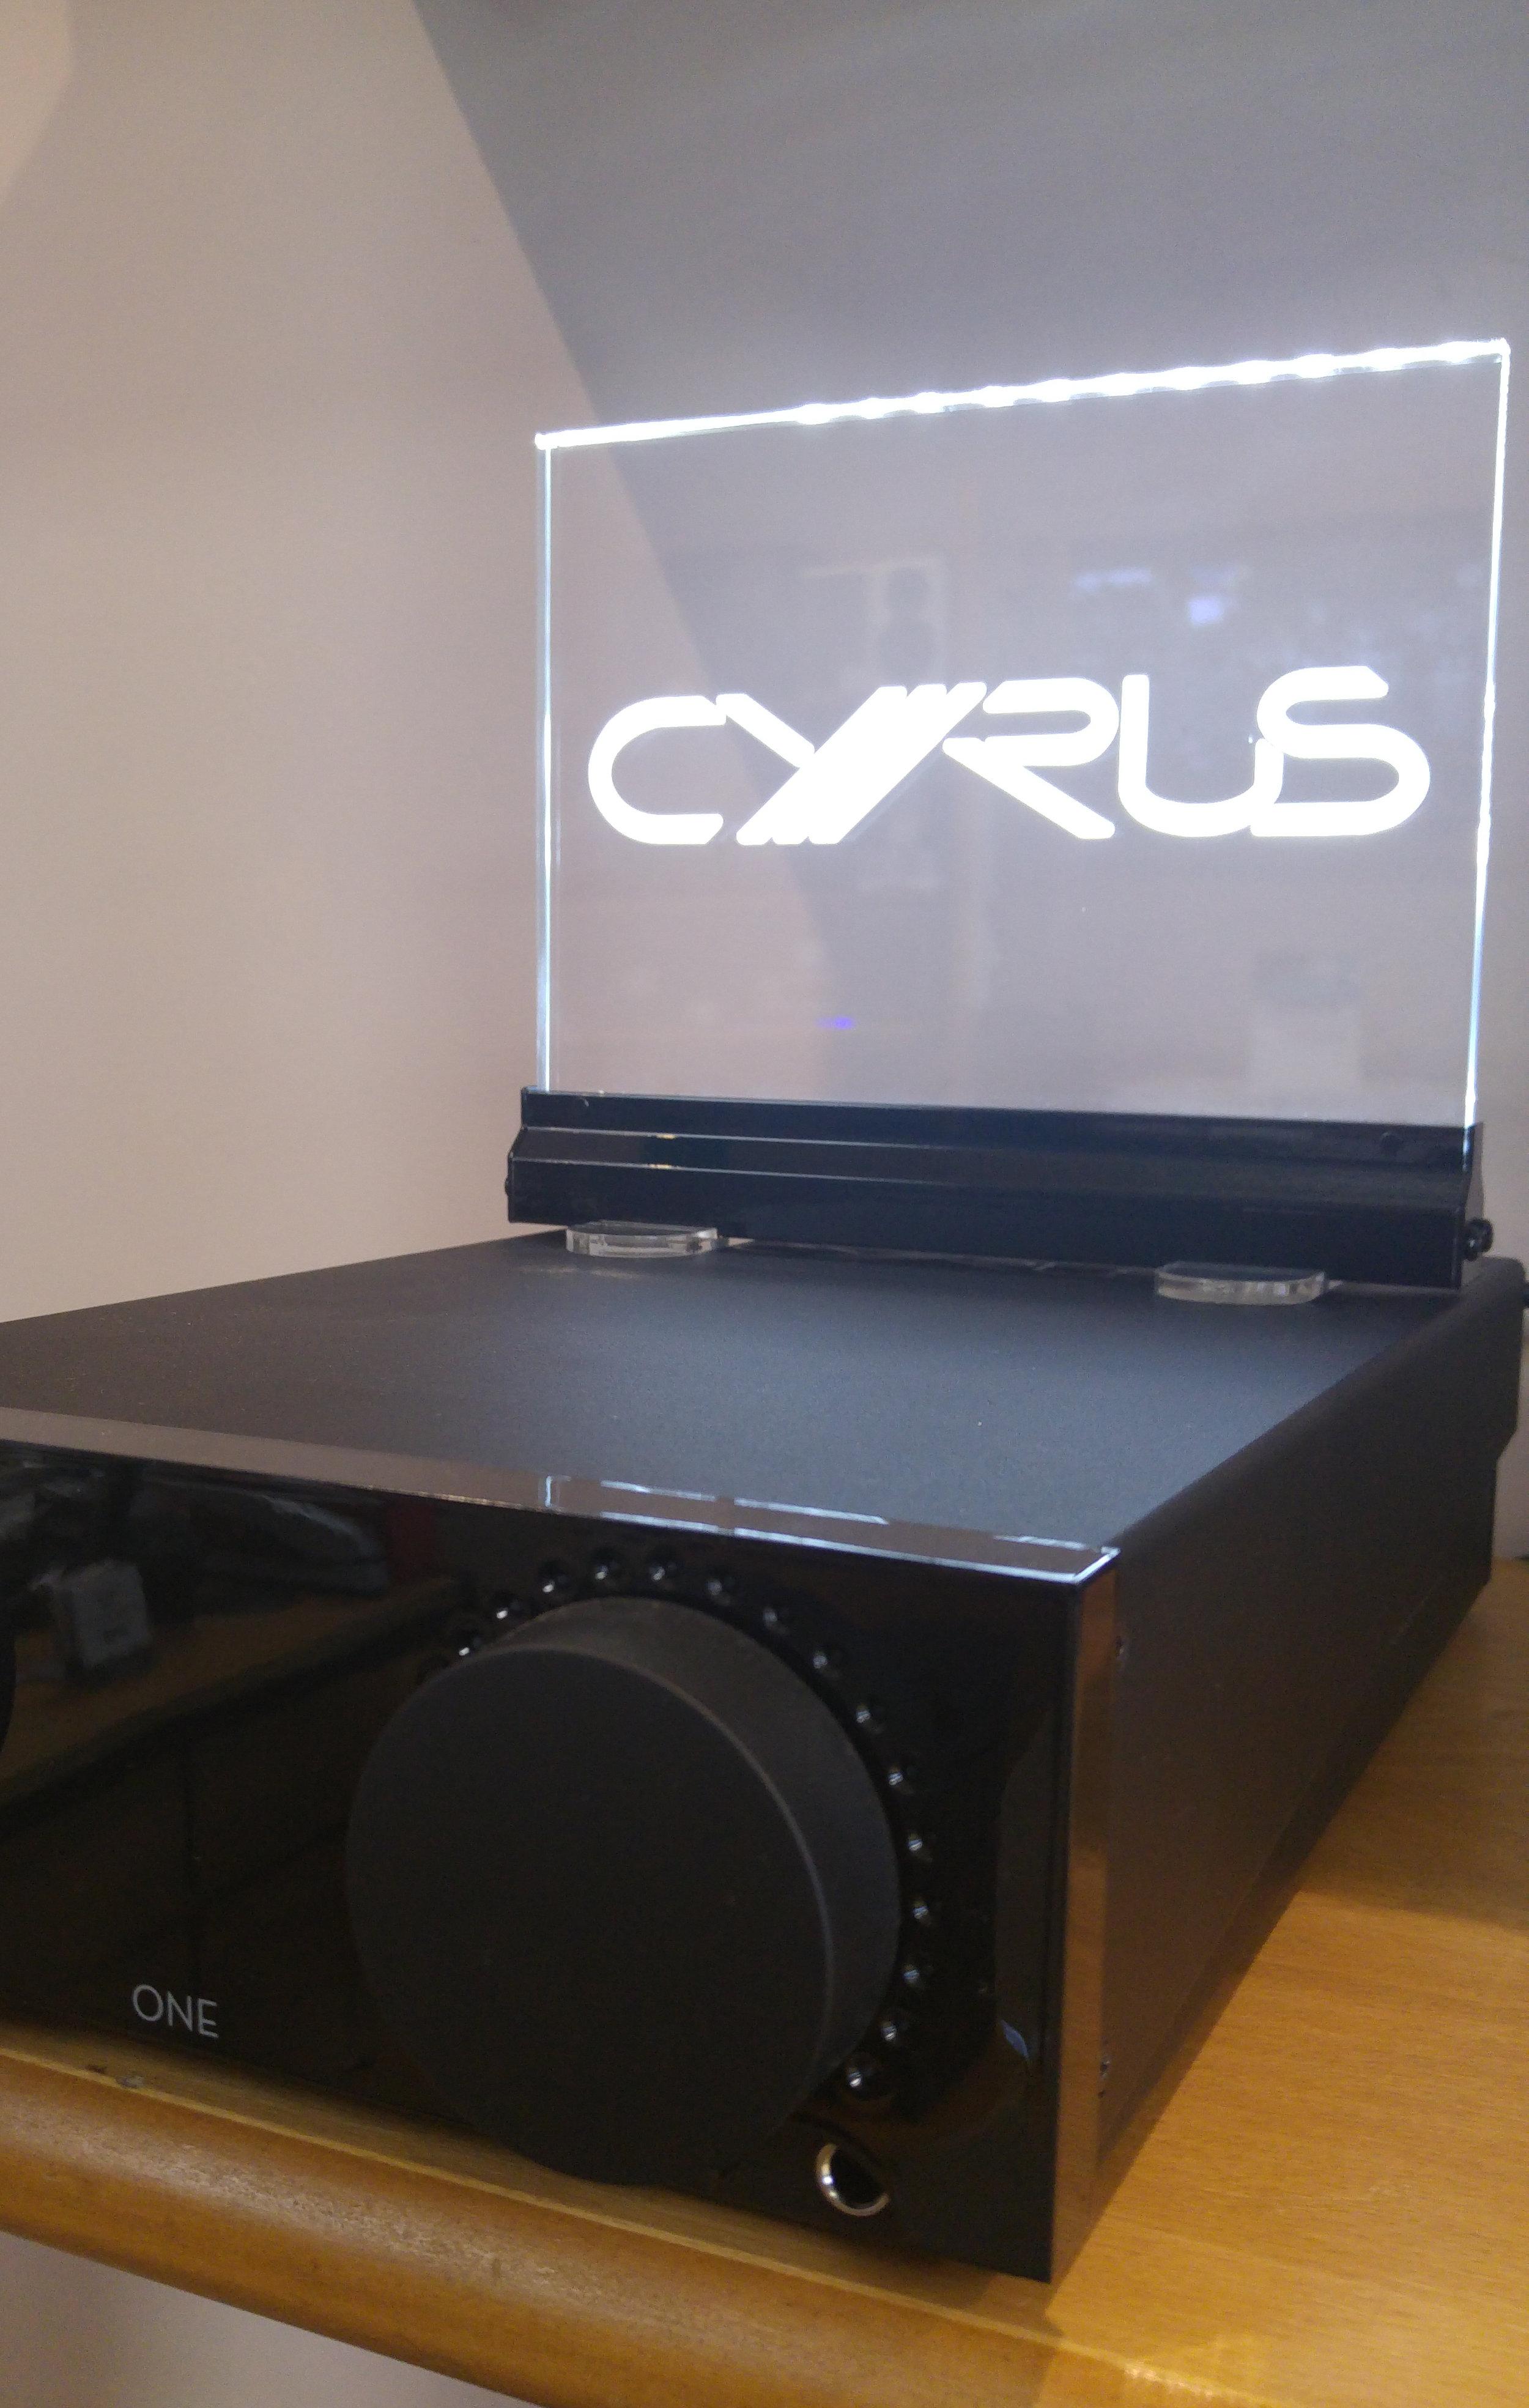 cyrus one2.jpg